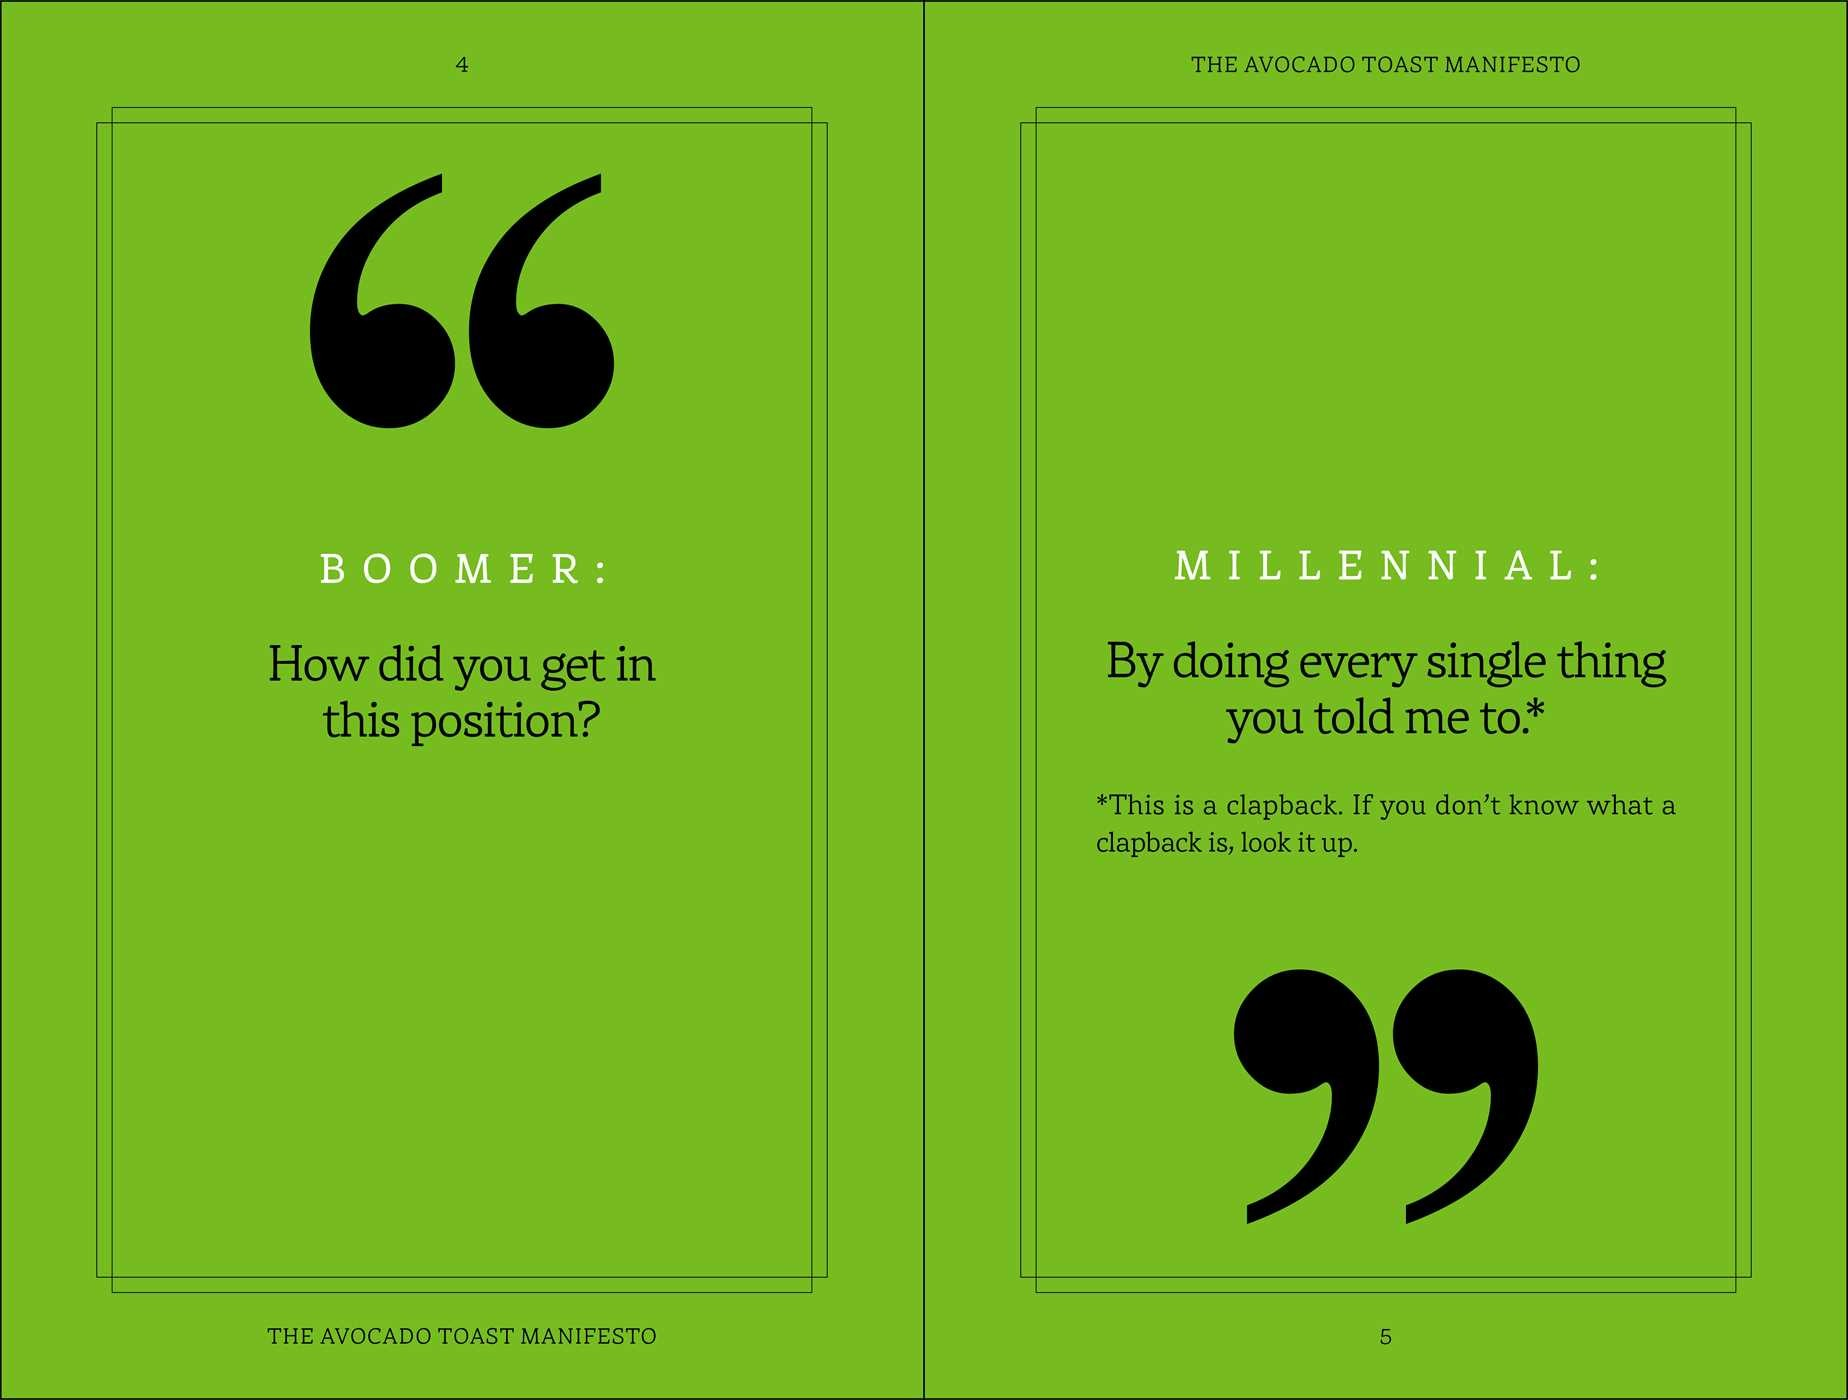 The avocado toast manifesto 9781604338560.in02